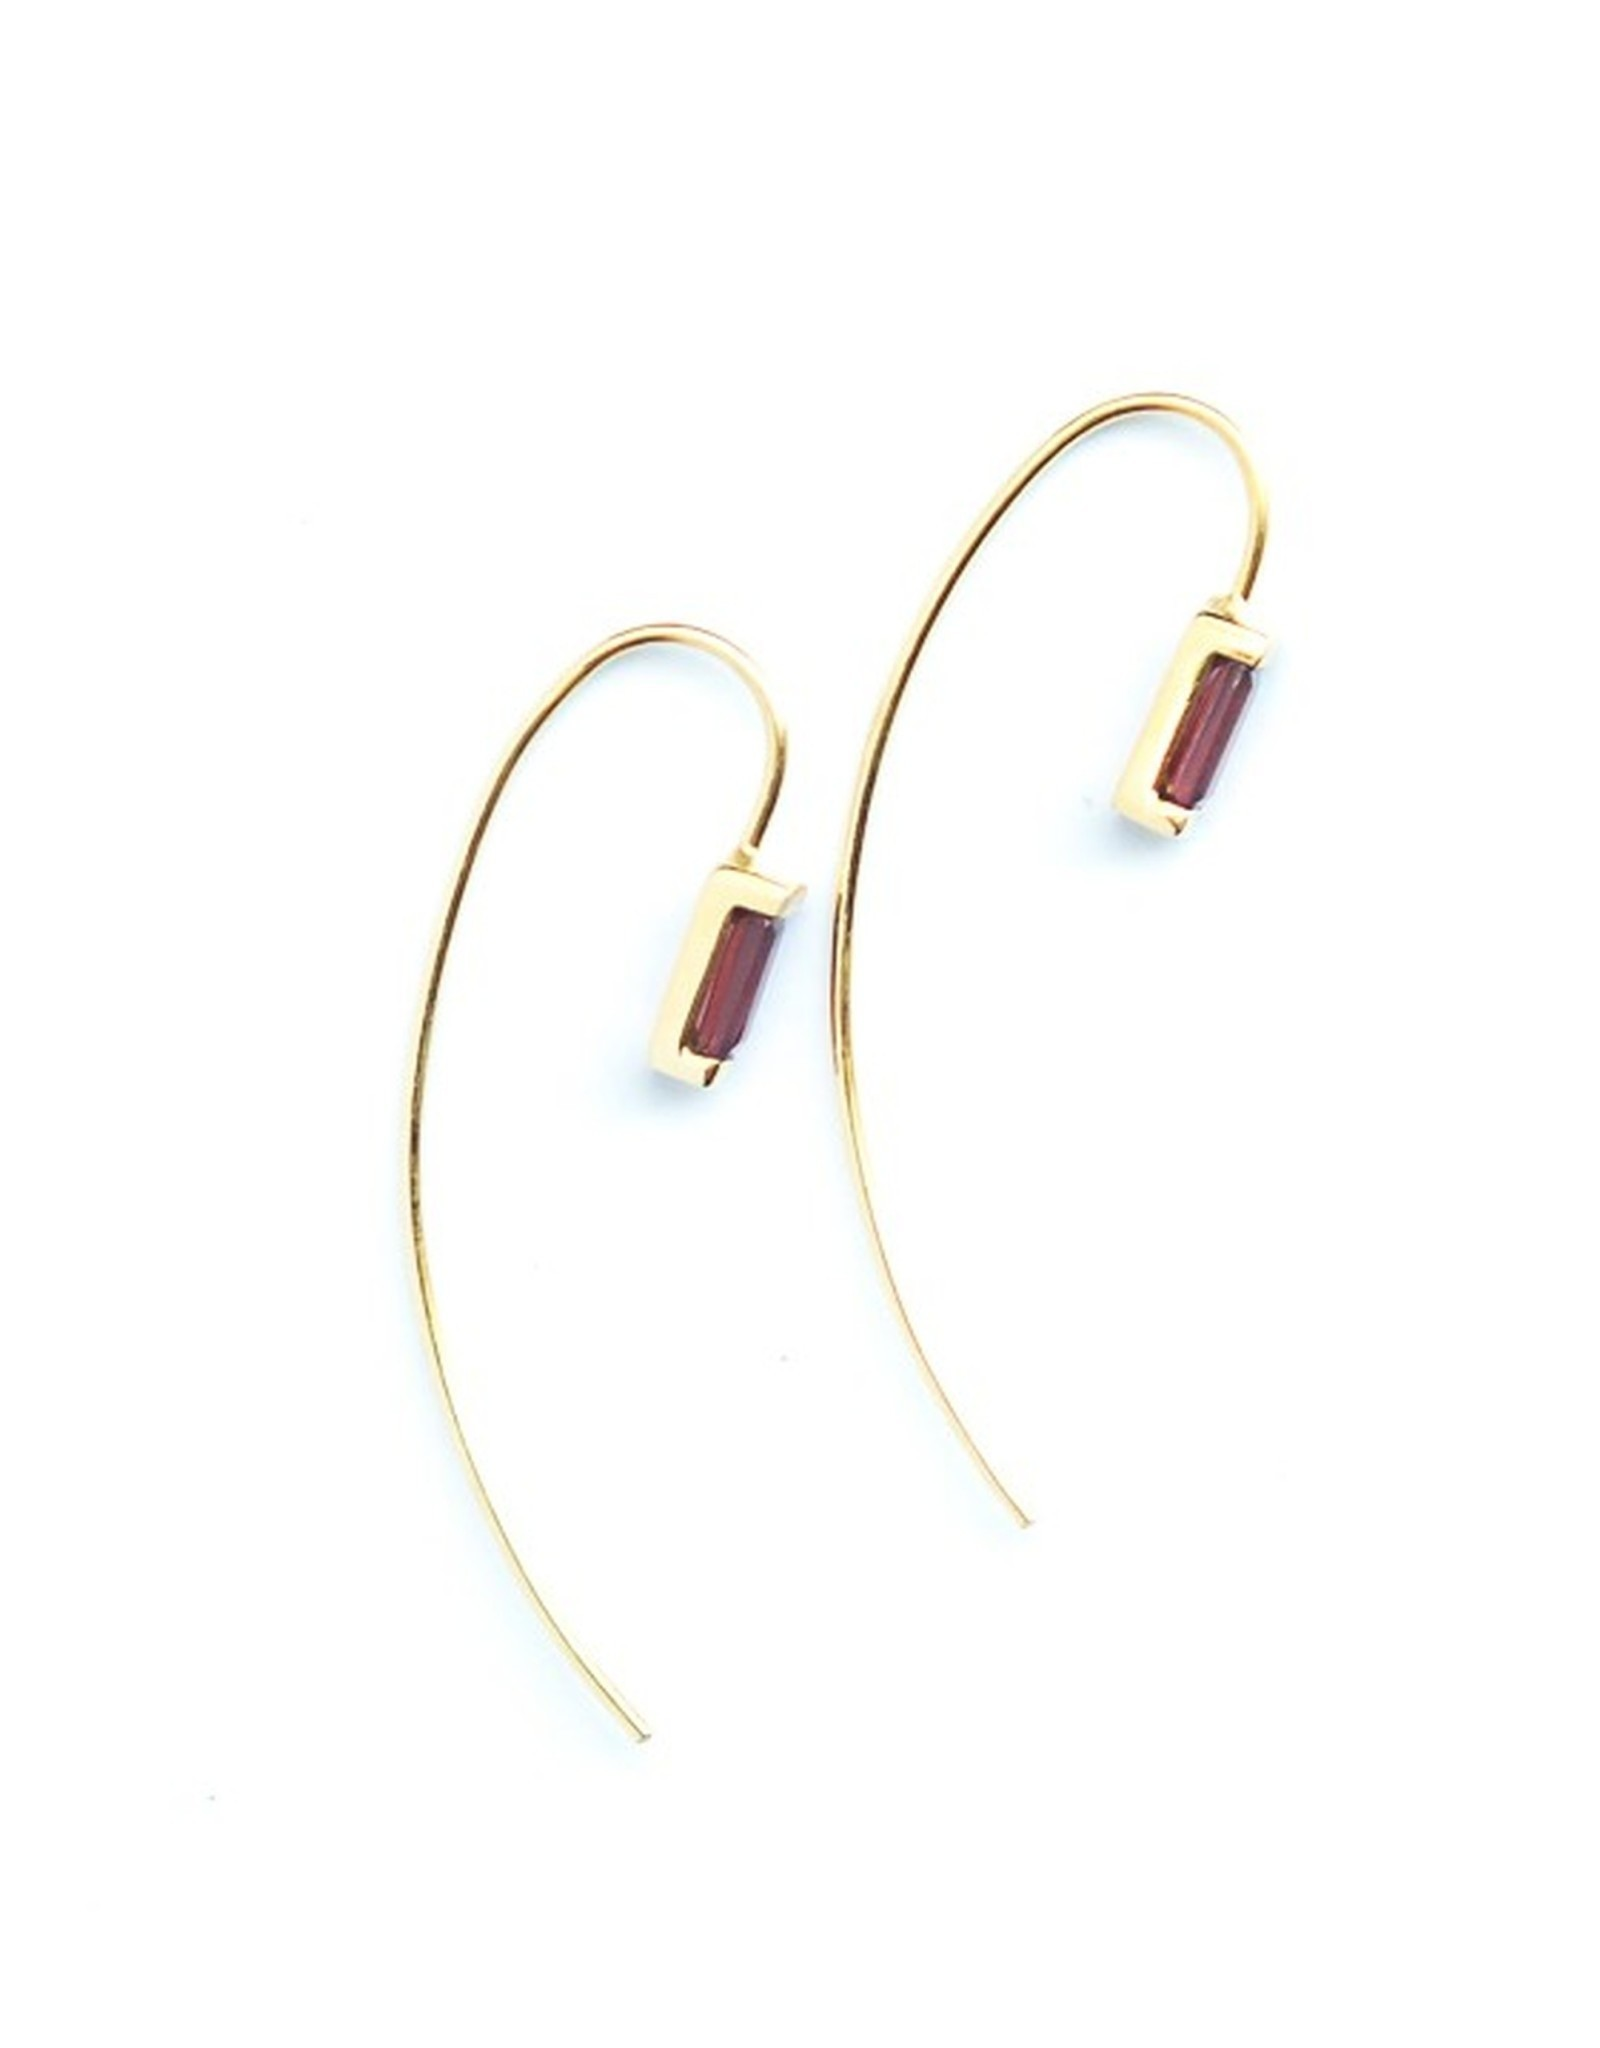 Fair Anita Prism Brass Earrings with Garnet, India